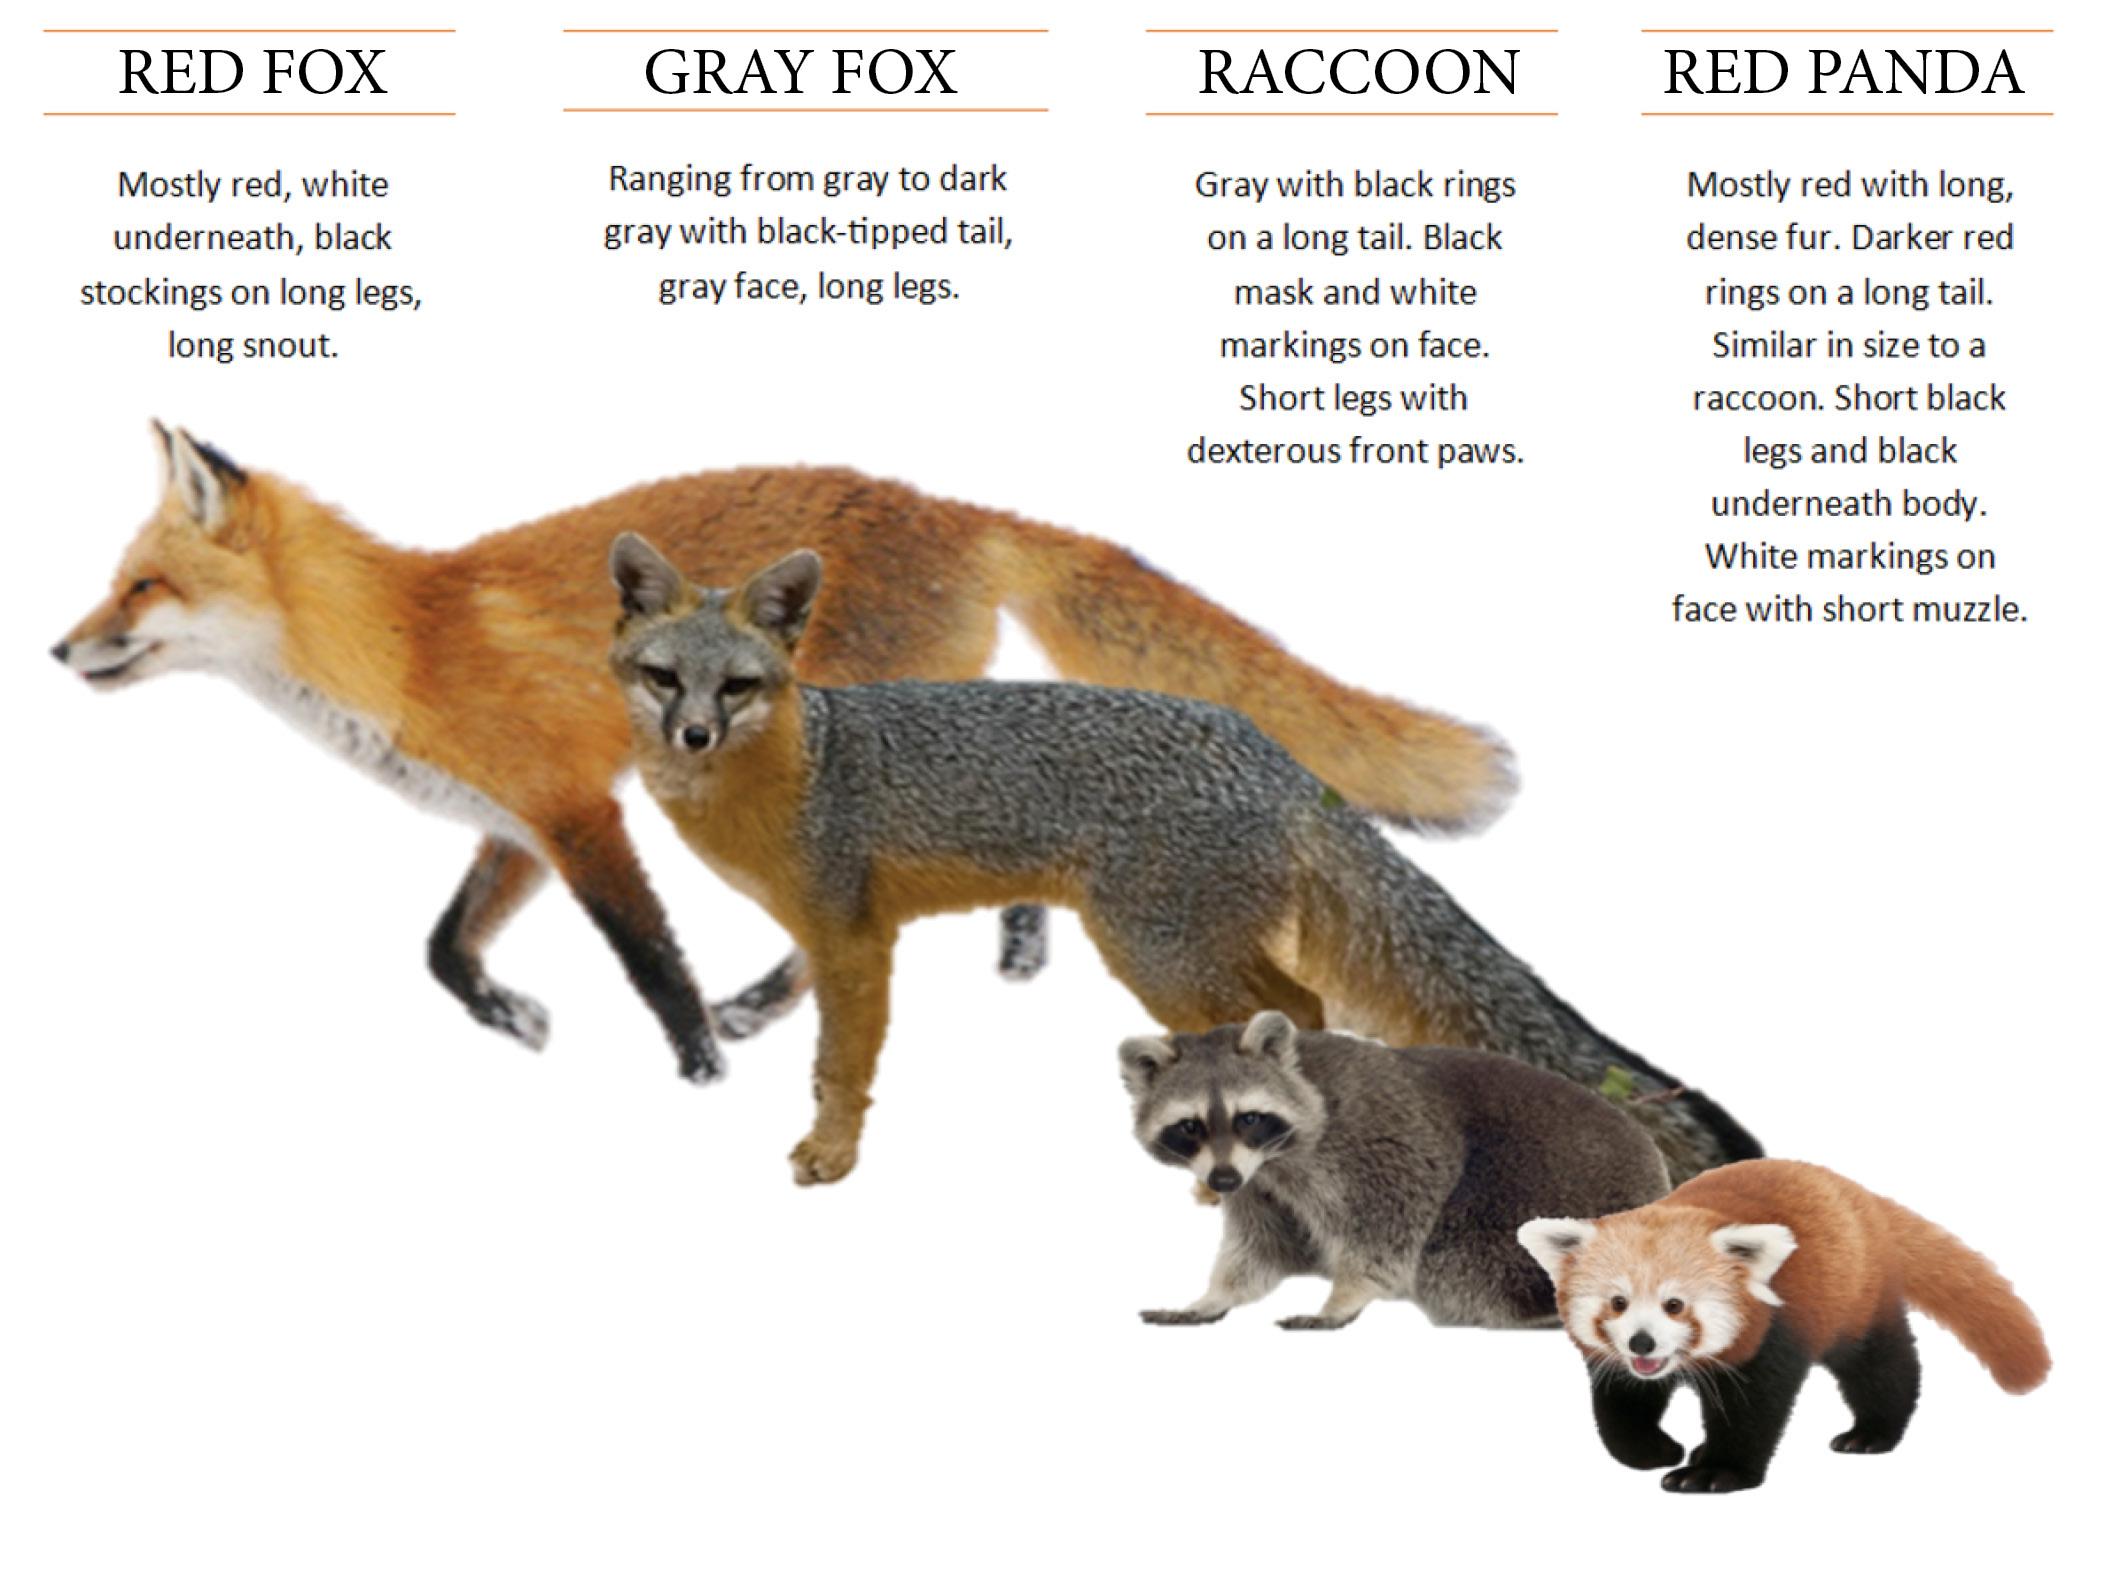 panda life cycle diagram fluid mosaic virginia zoo red is missing from habitat